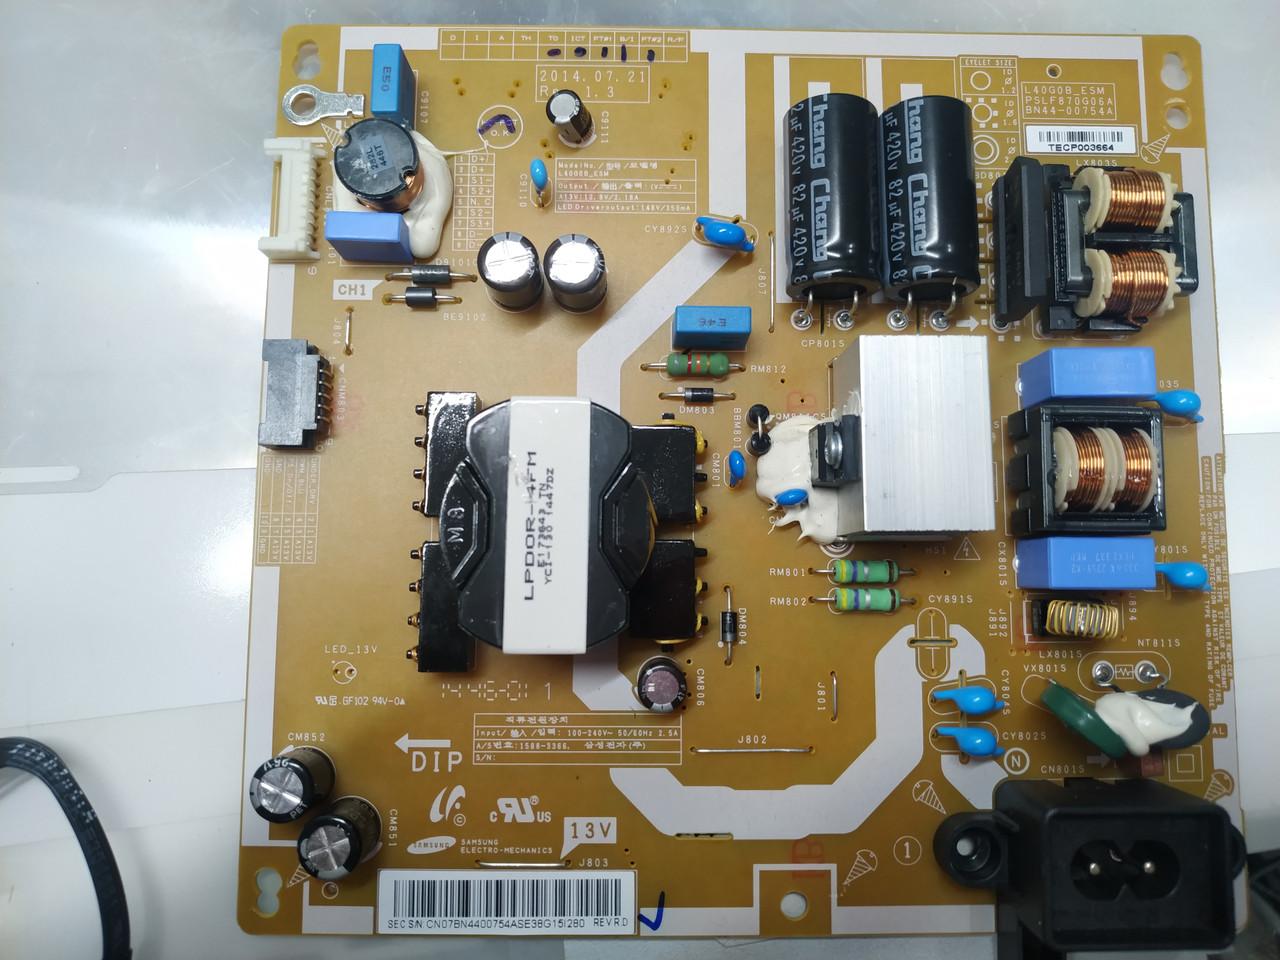 Запчасти для телевизора Samsung UE43J5500 (BN41-02347A, BN44-00754A, PSLF870G06A)